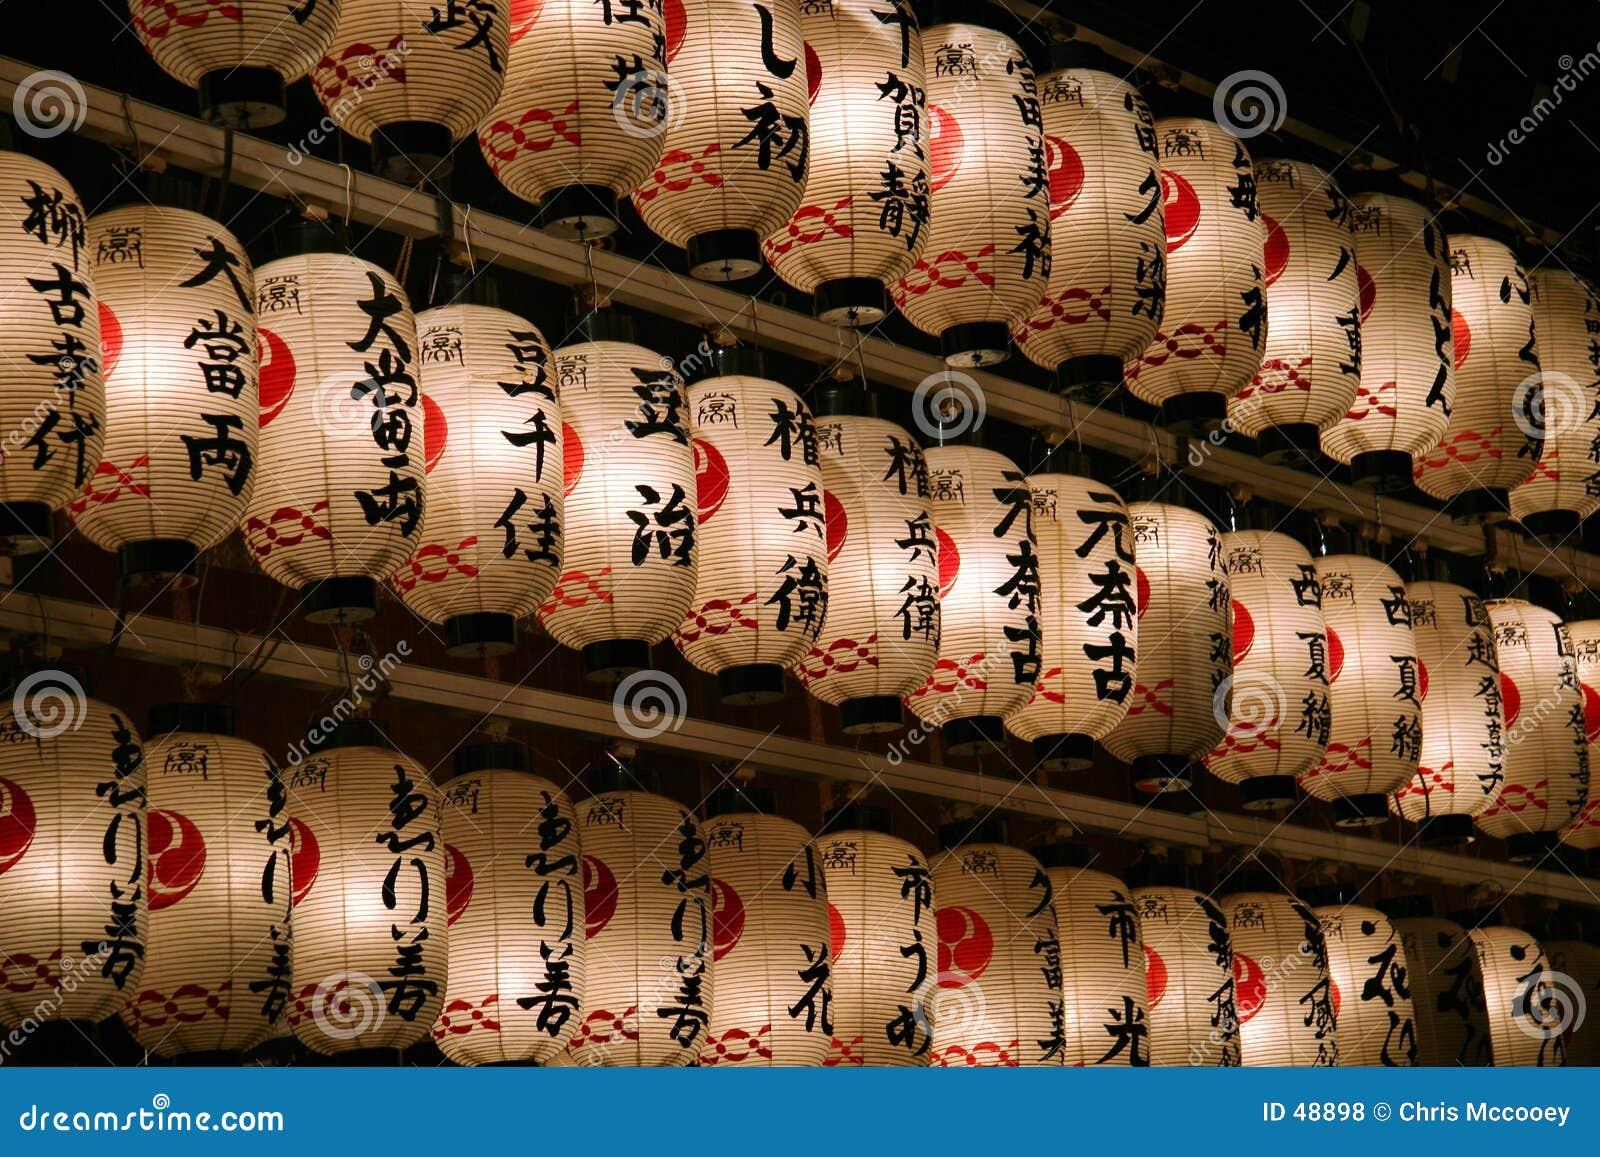 Lanternas japonesas na noite.